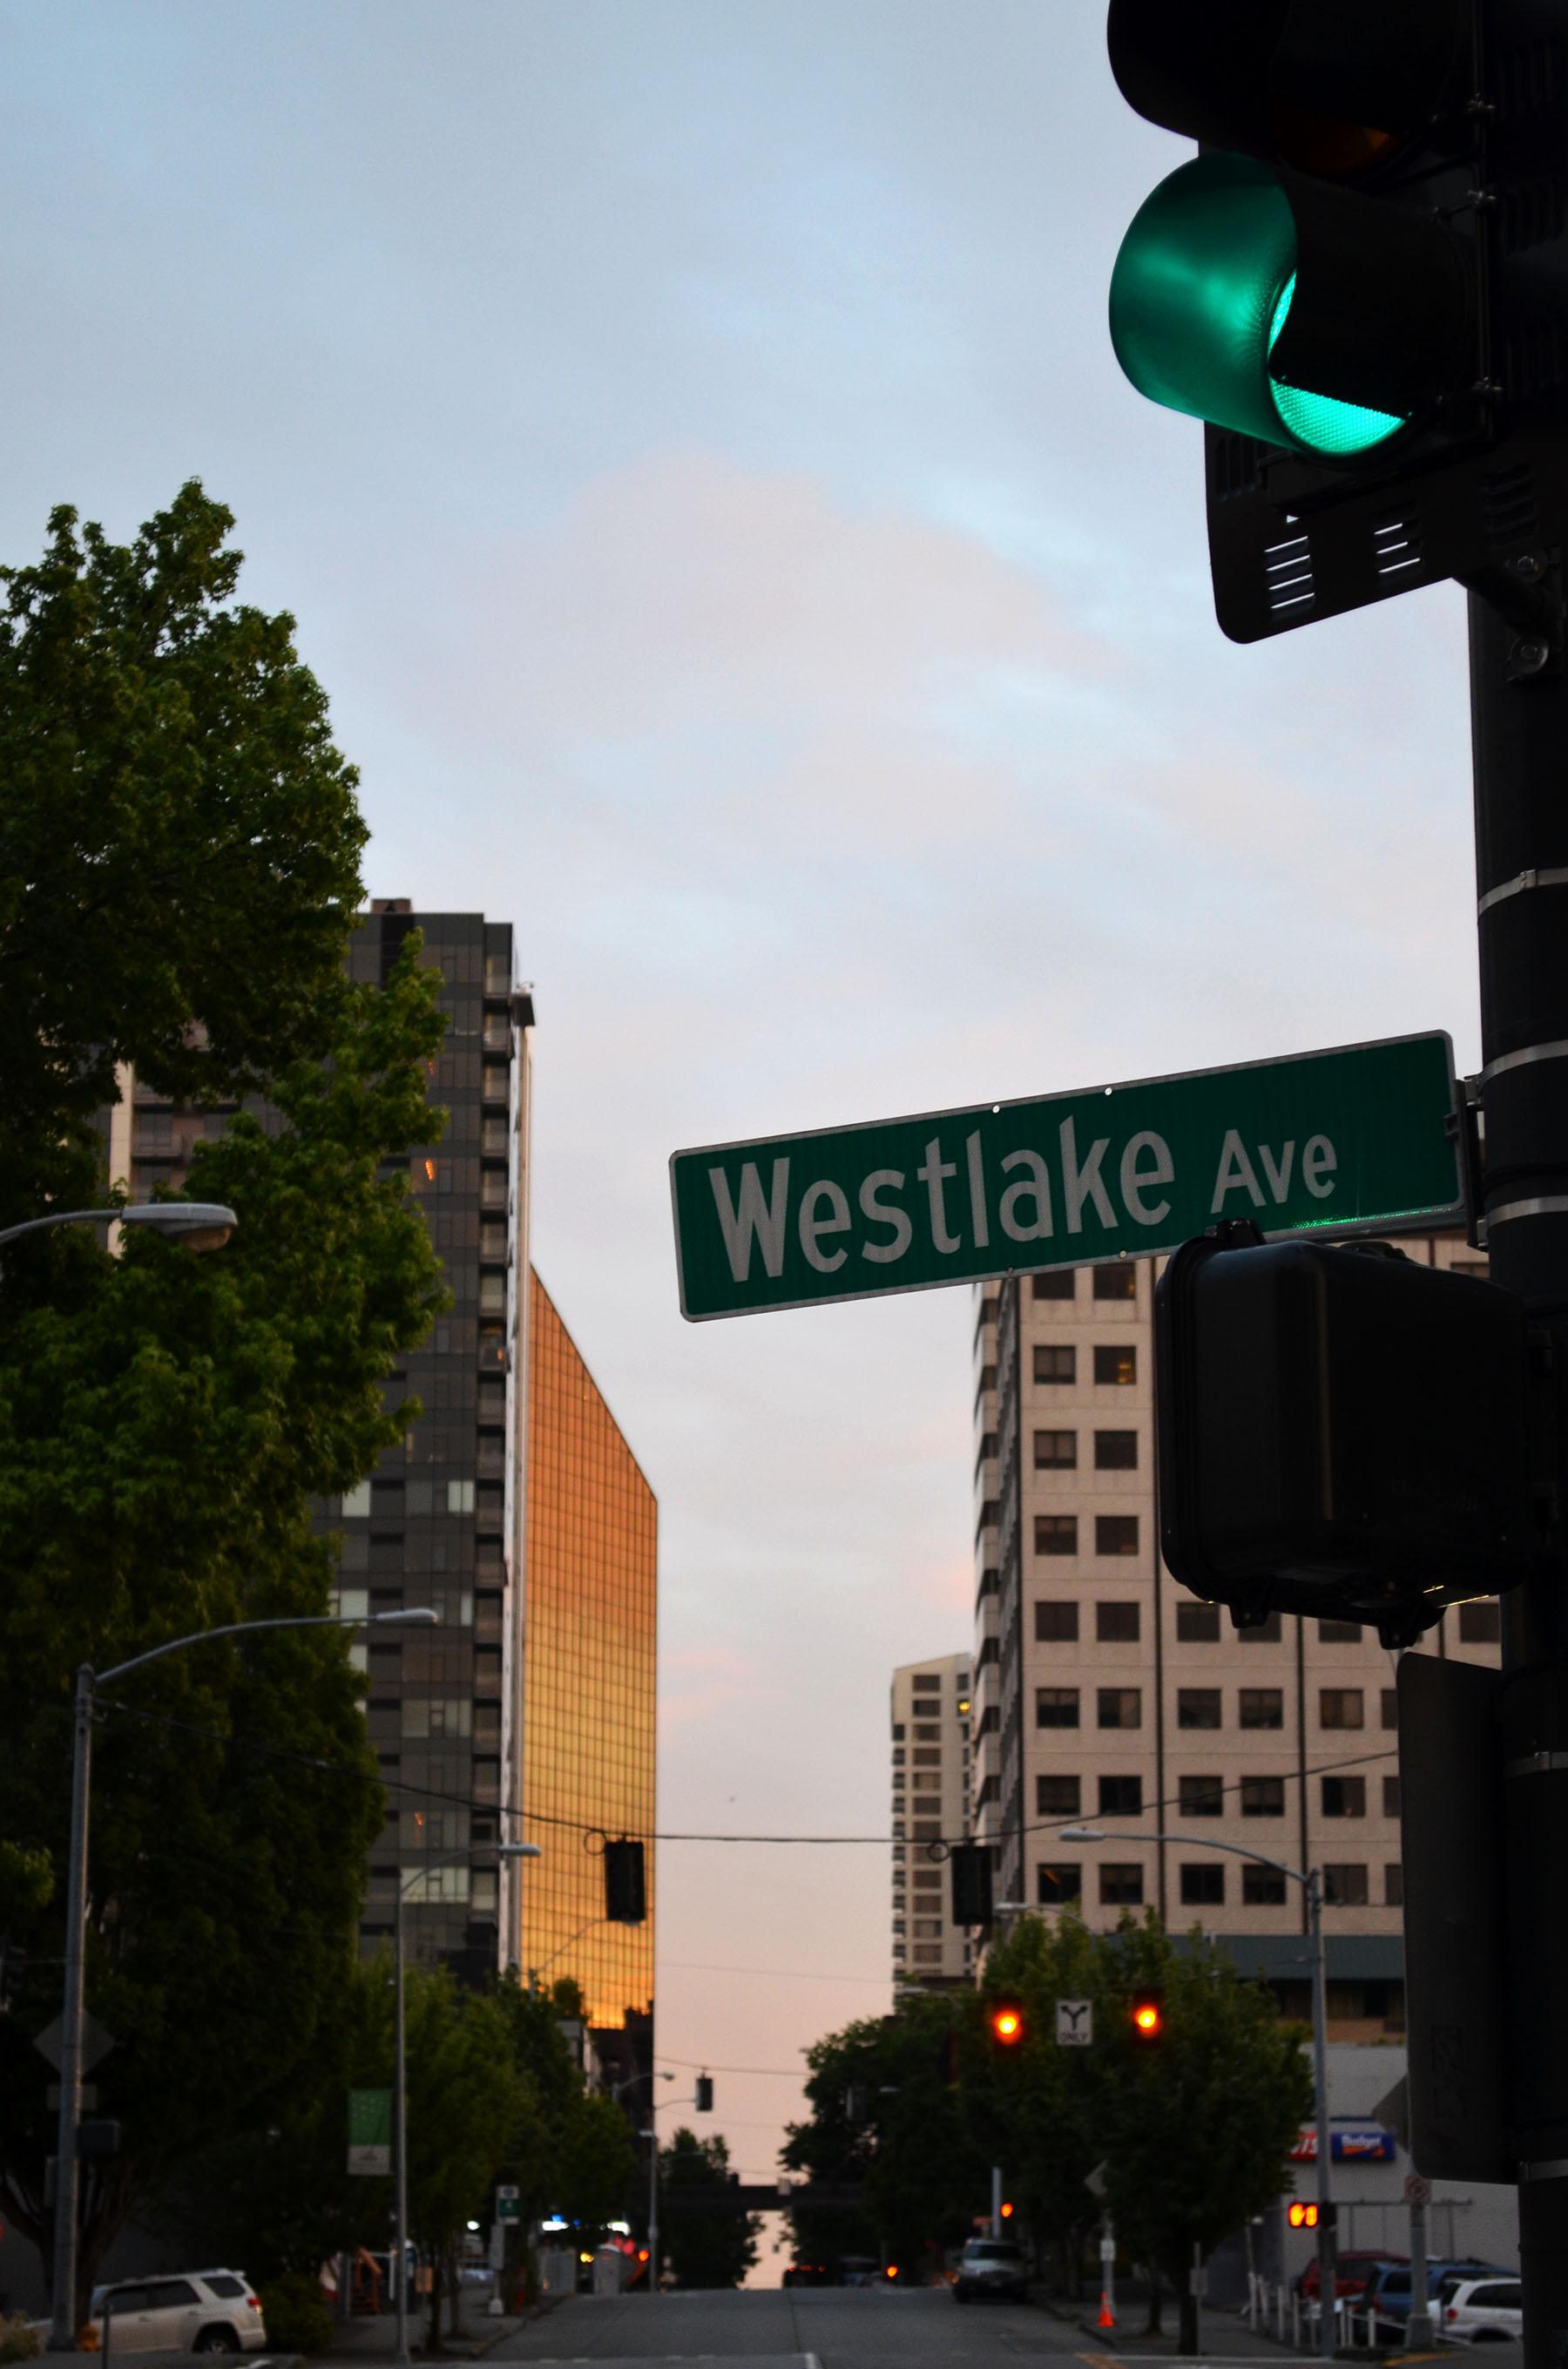 Westlake Ave